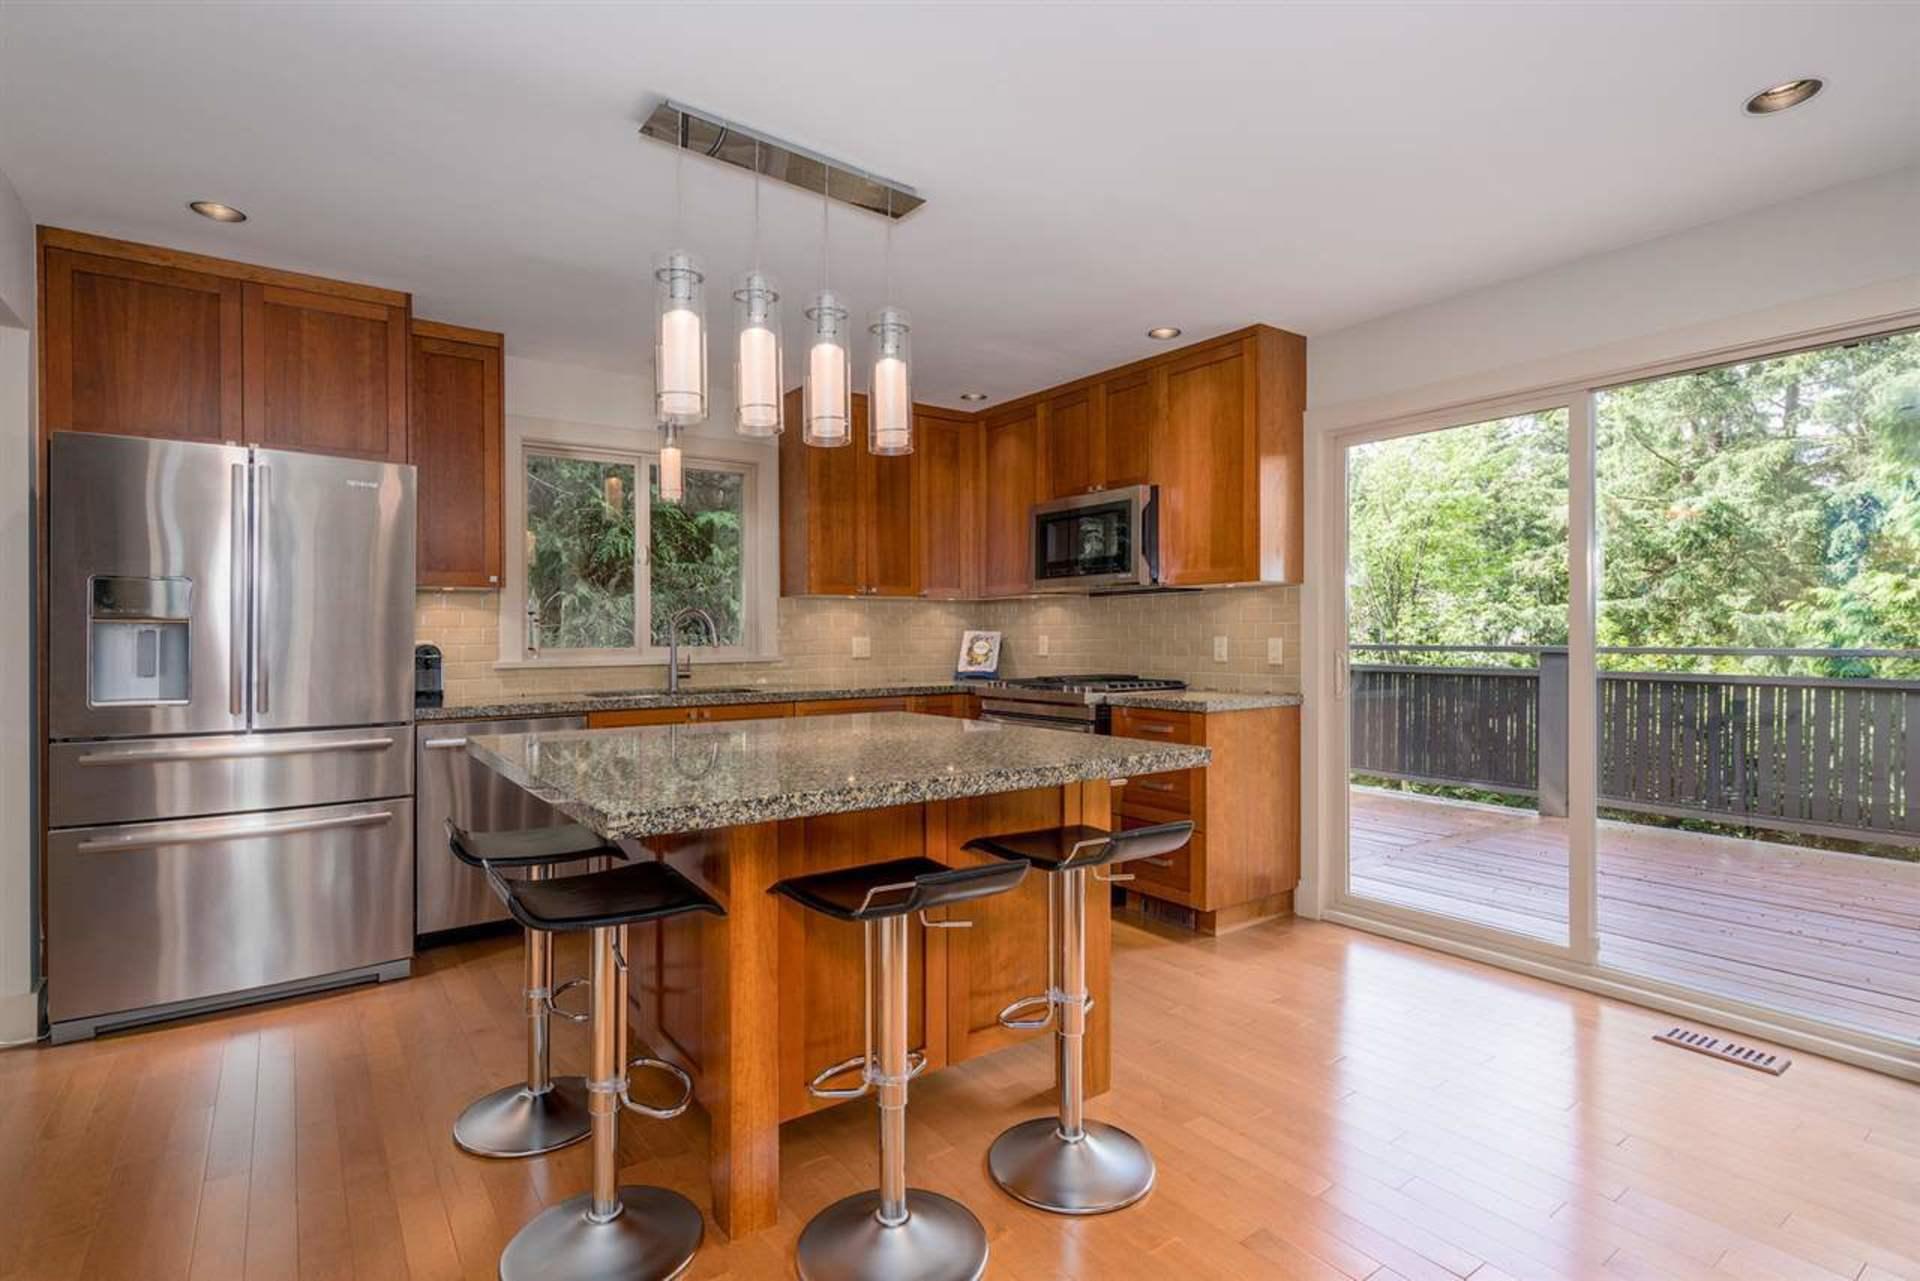 4620-woodburn-road-cypress-park-estates-west-vancouver-09 at 4620 Woodburn Road, Cypress Park Estates, West Vancouver